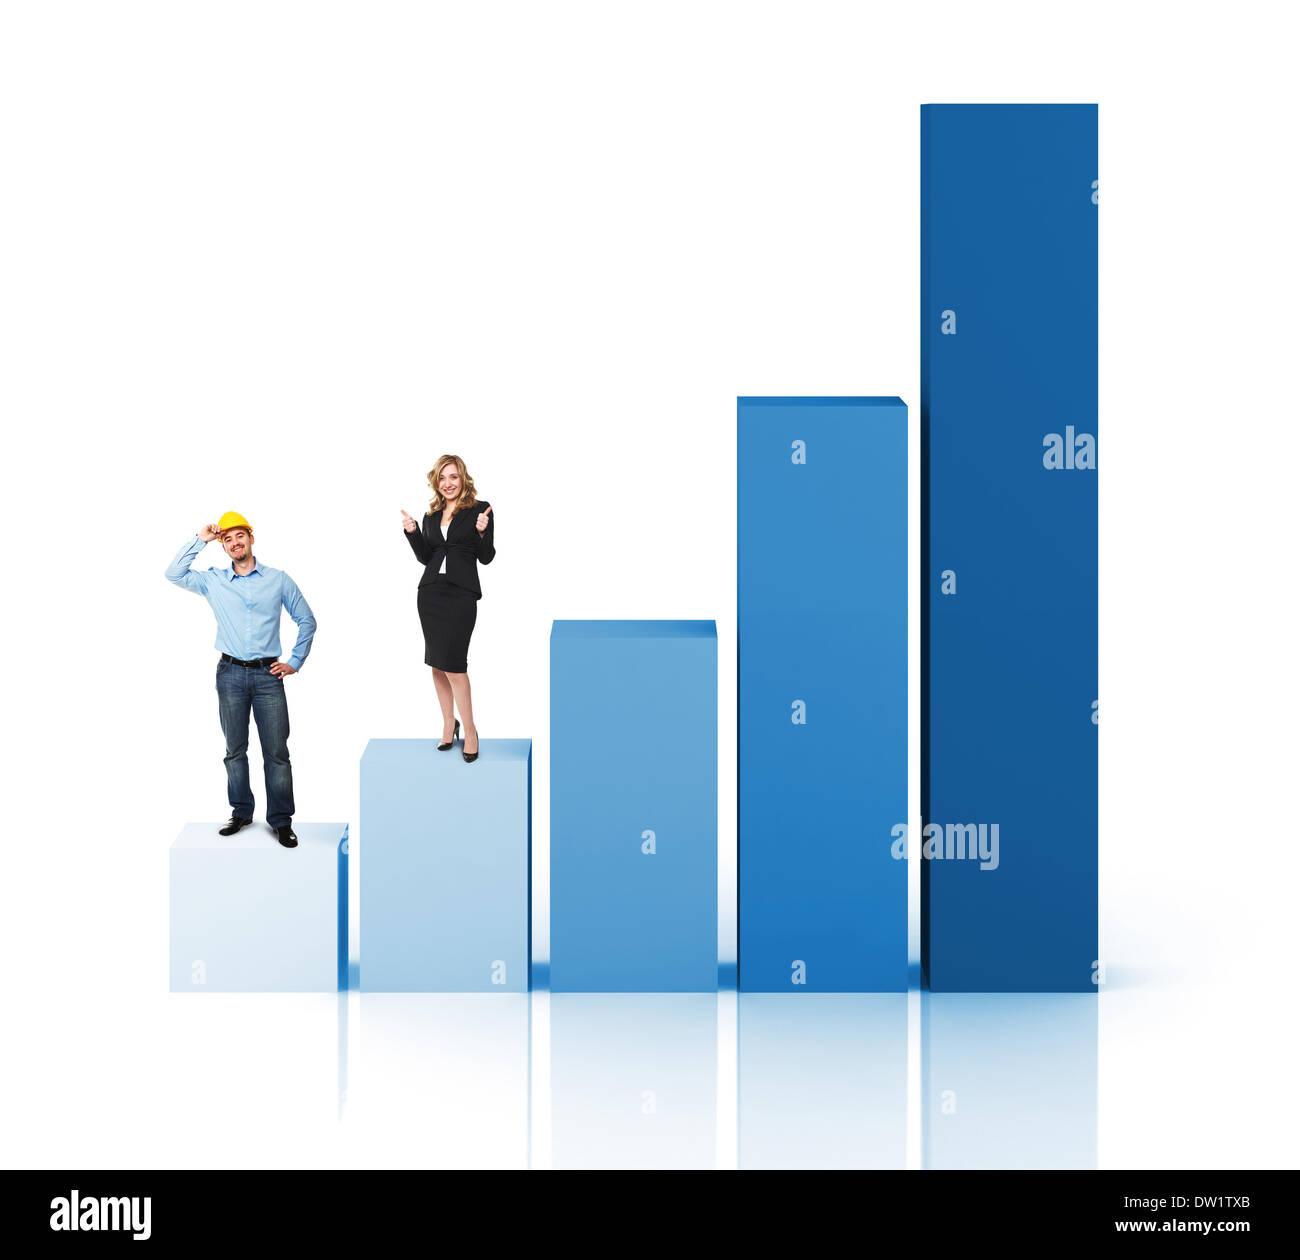 improve business - Stock Image